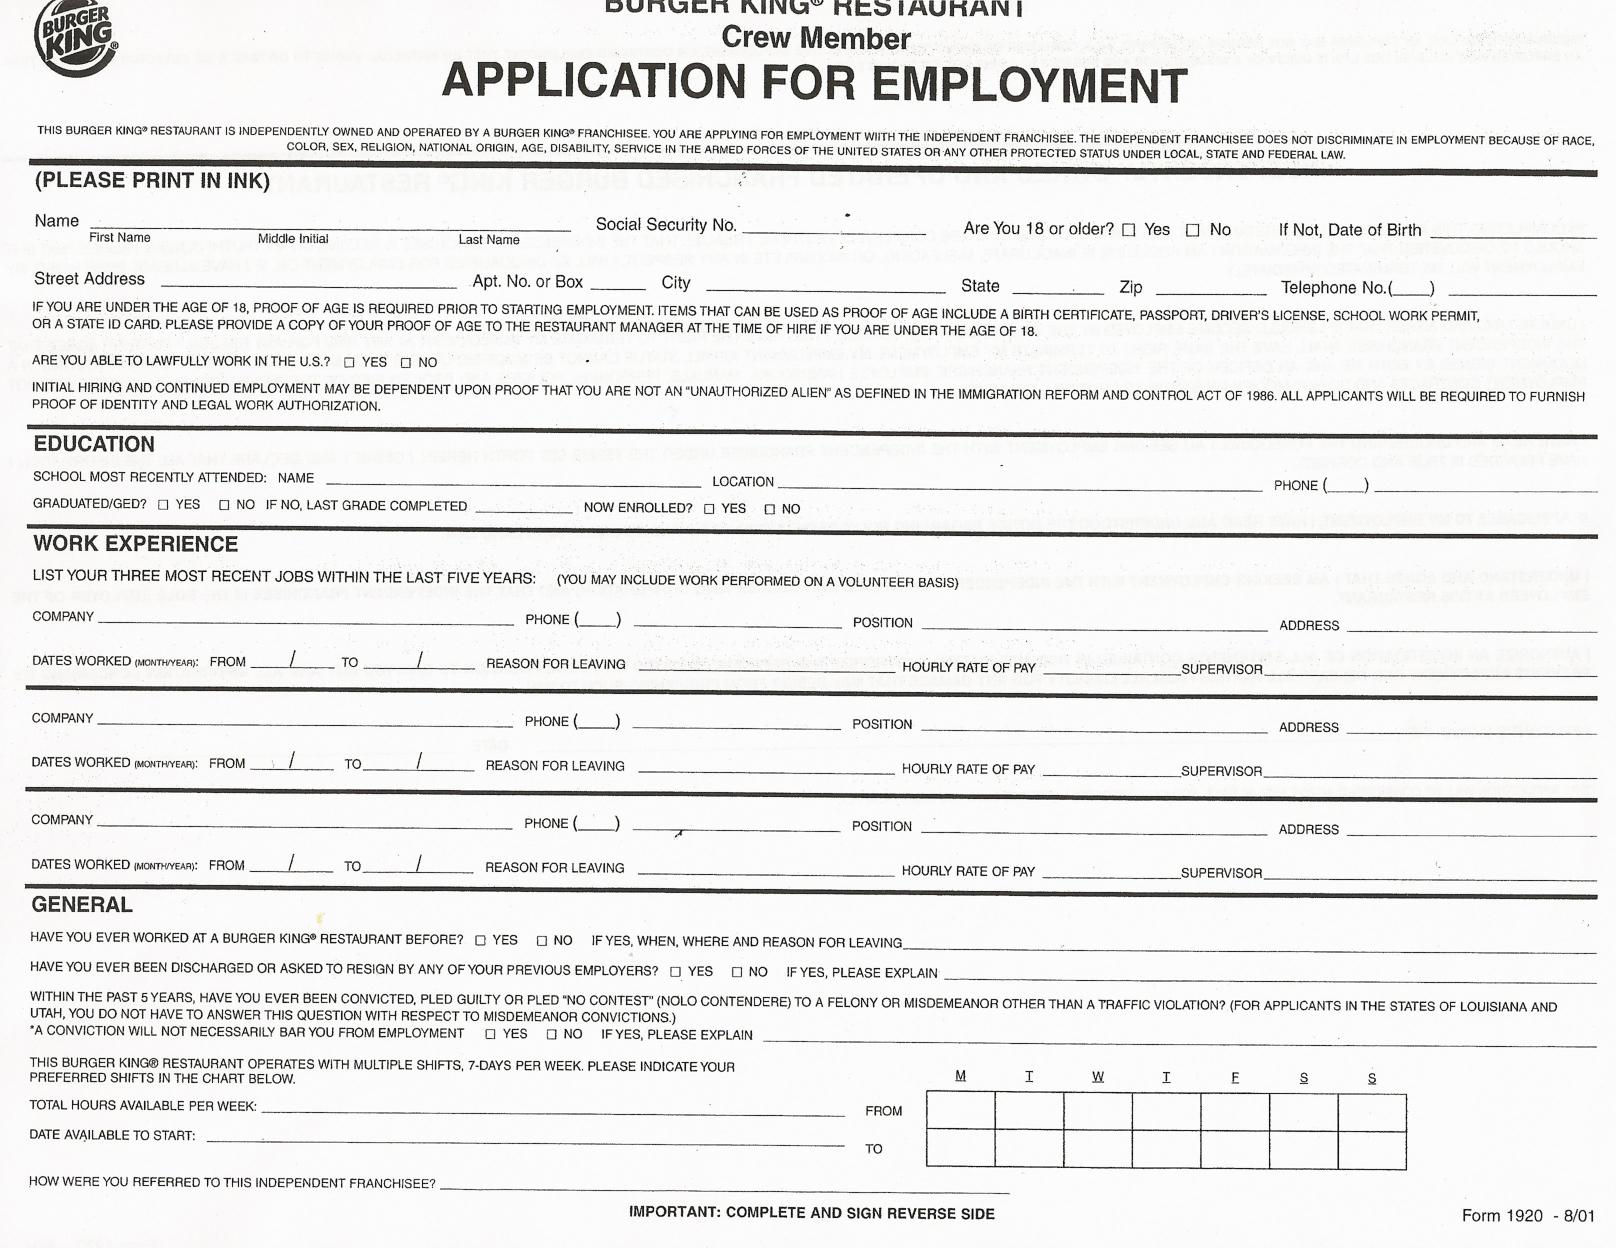 Job Application Printable Job Applications Printable Job Application - Free Printable Job Applications Online